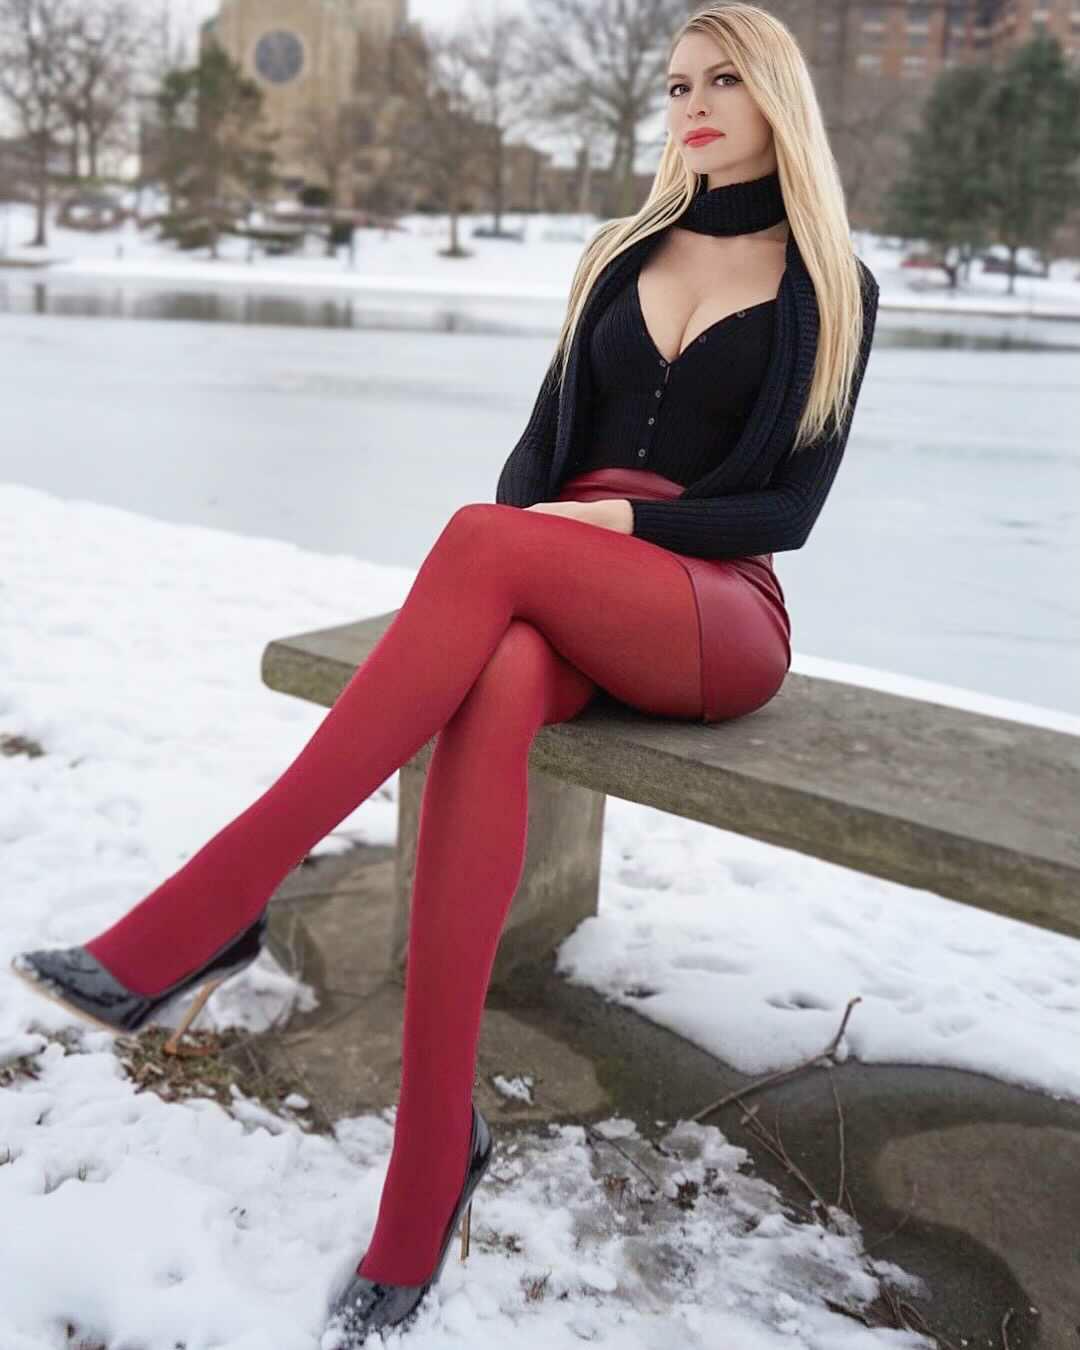 Do You Like The Red Pantyhose?